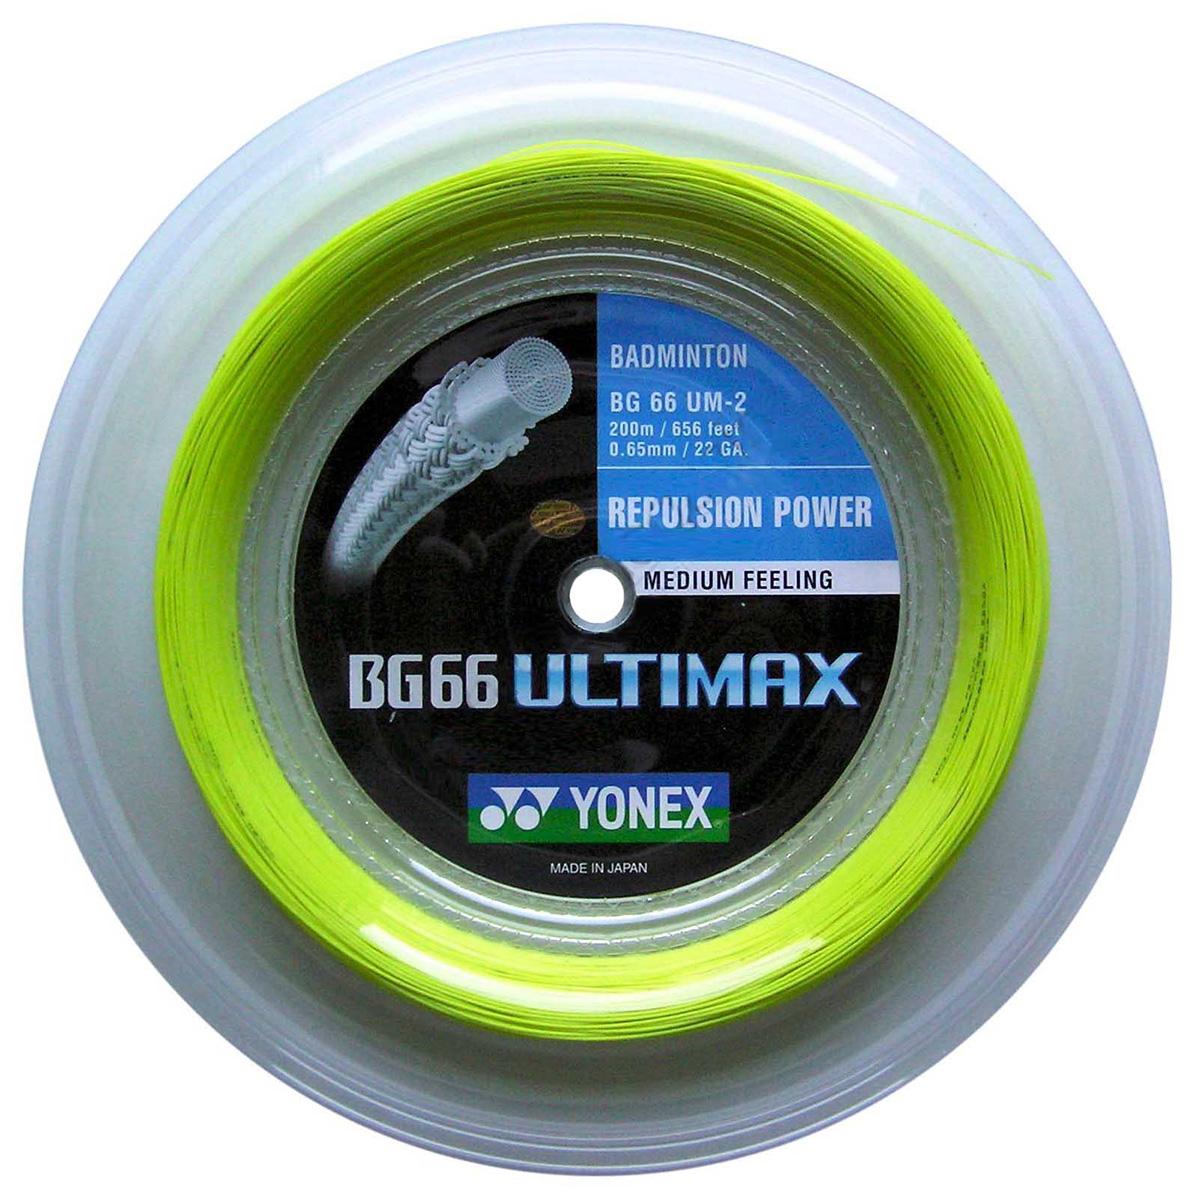 Yonex BG66 Ultimax Badminton String - 200m Reel - Yellow